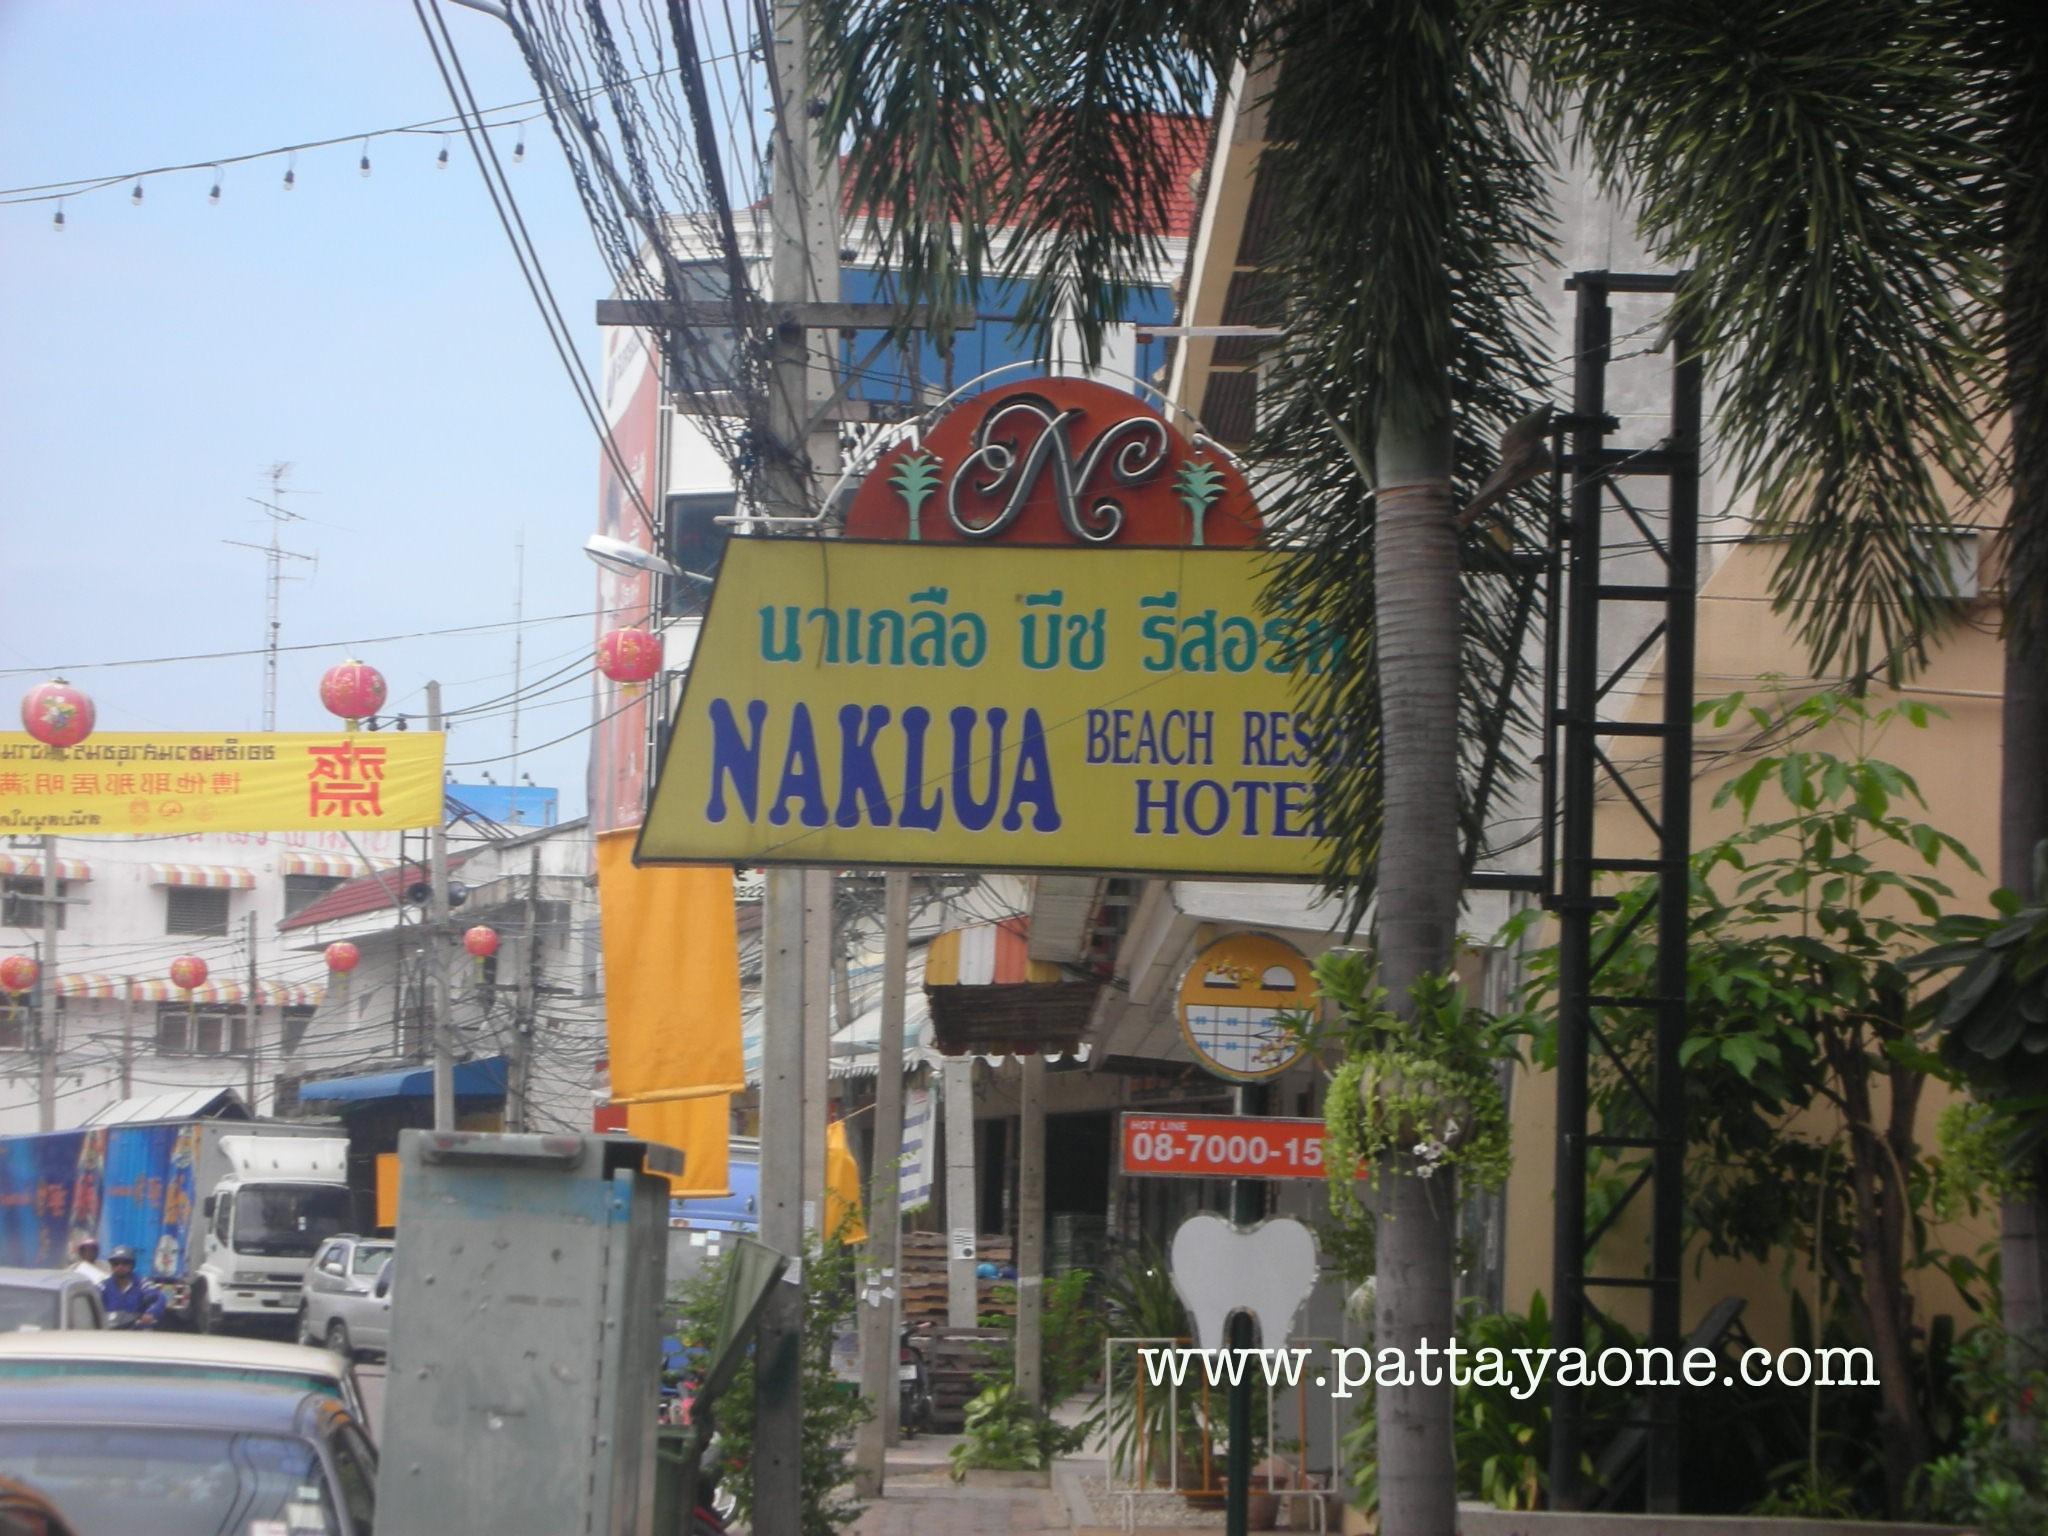 Naklua Beach resort www.pattayaone.com